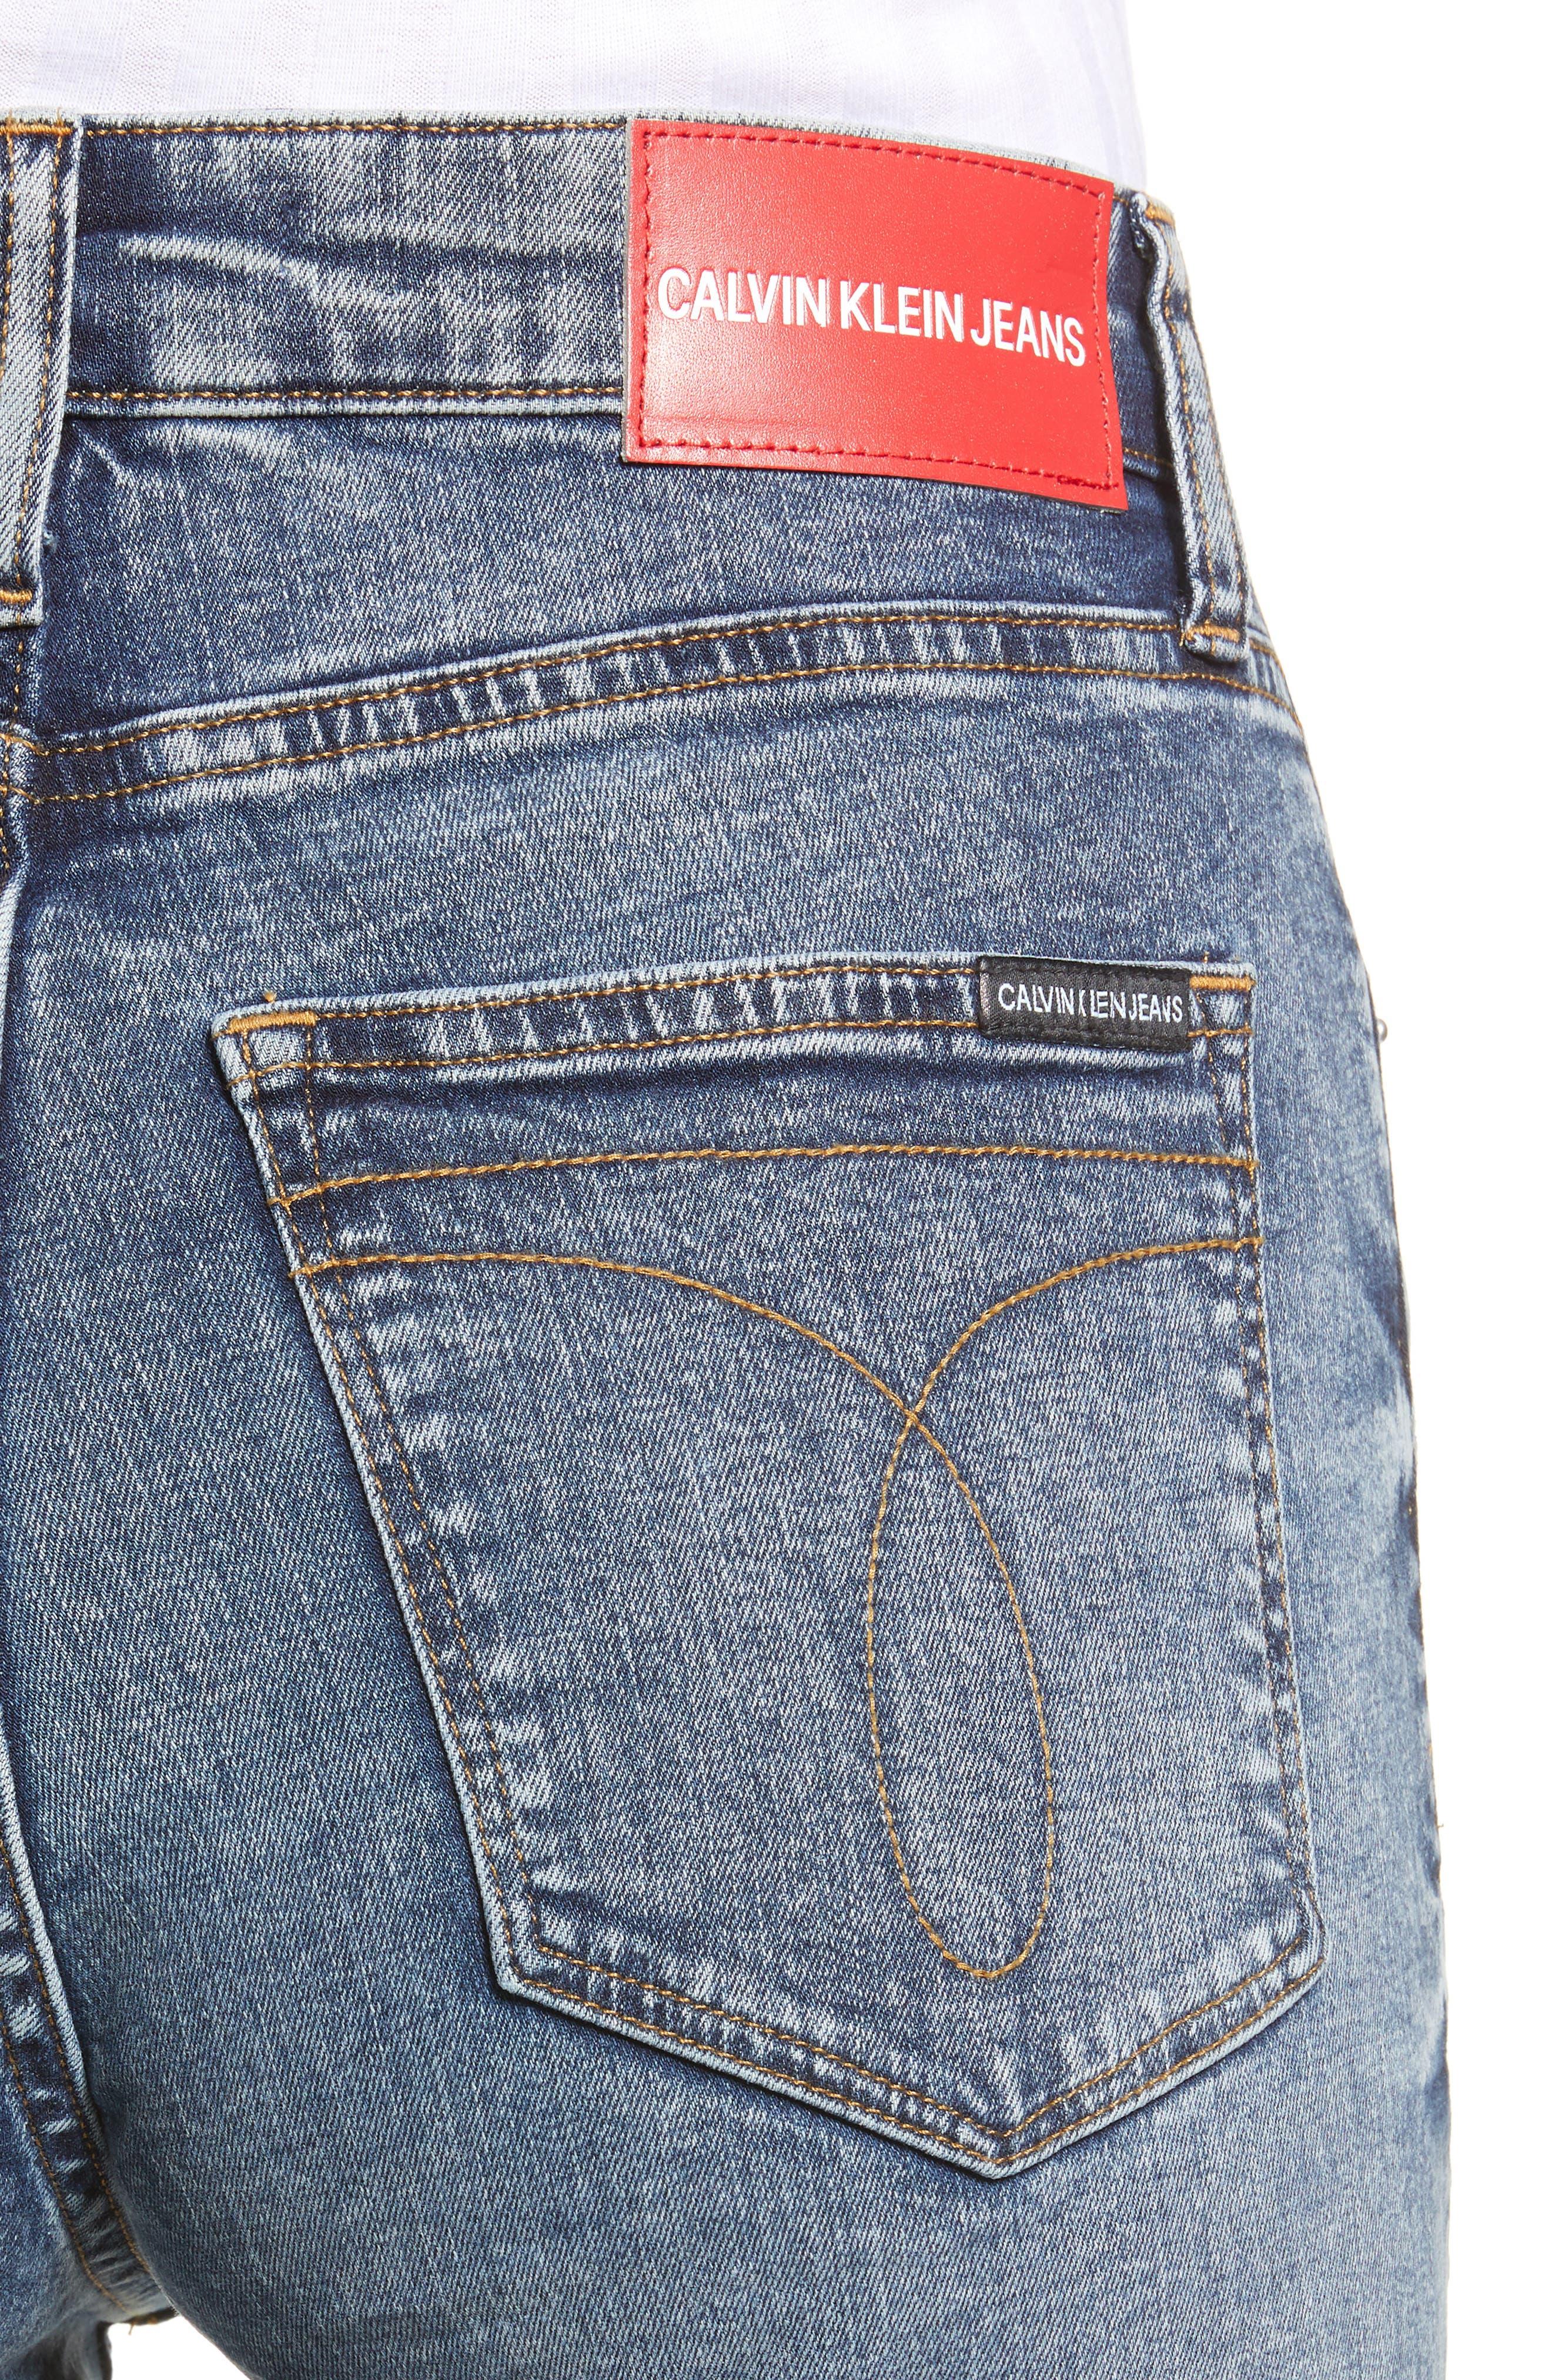 High Waist Skinny Jeans,                             Alternate thumbnail 4, color,                             400